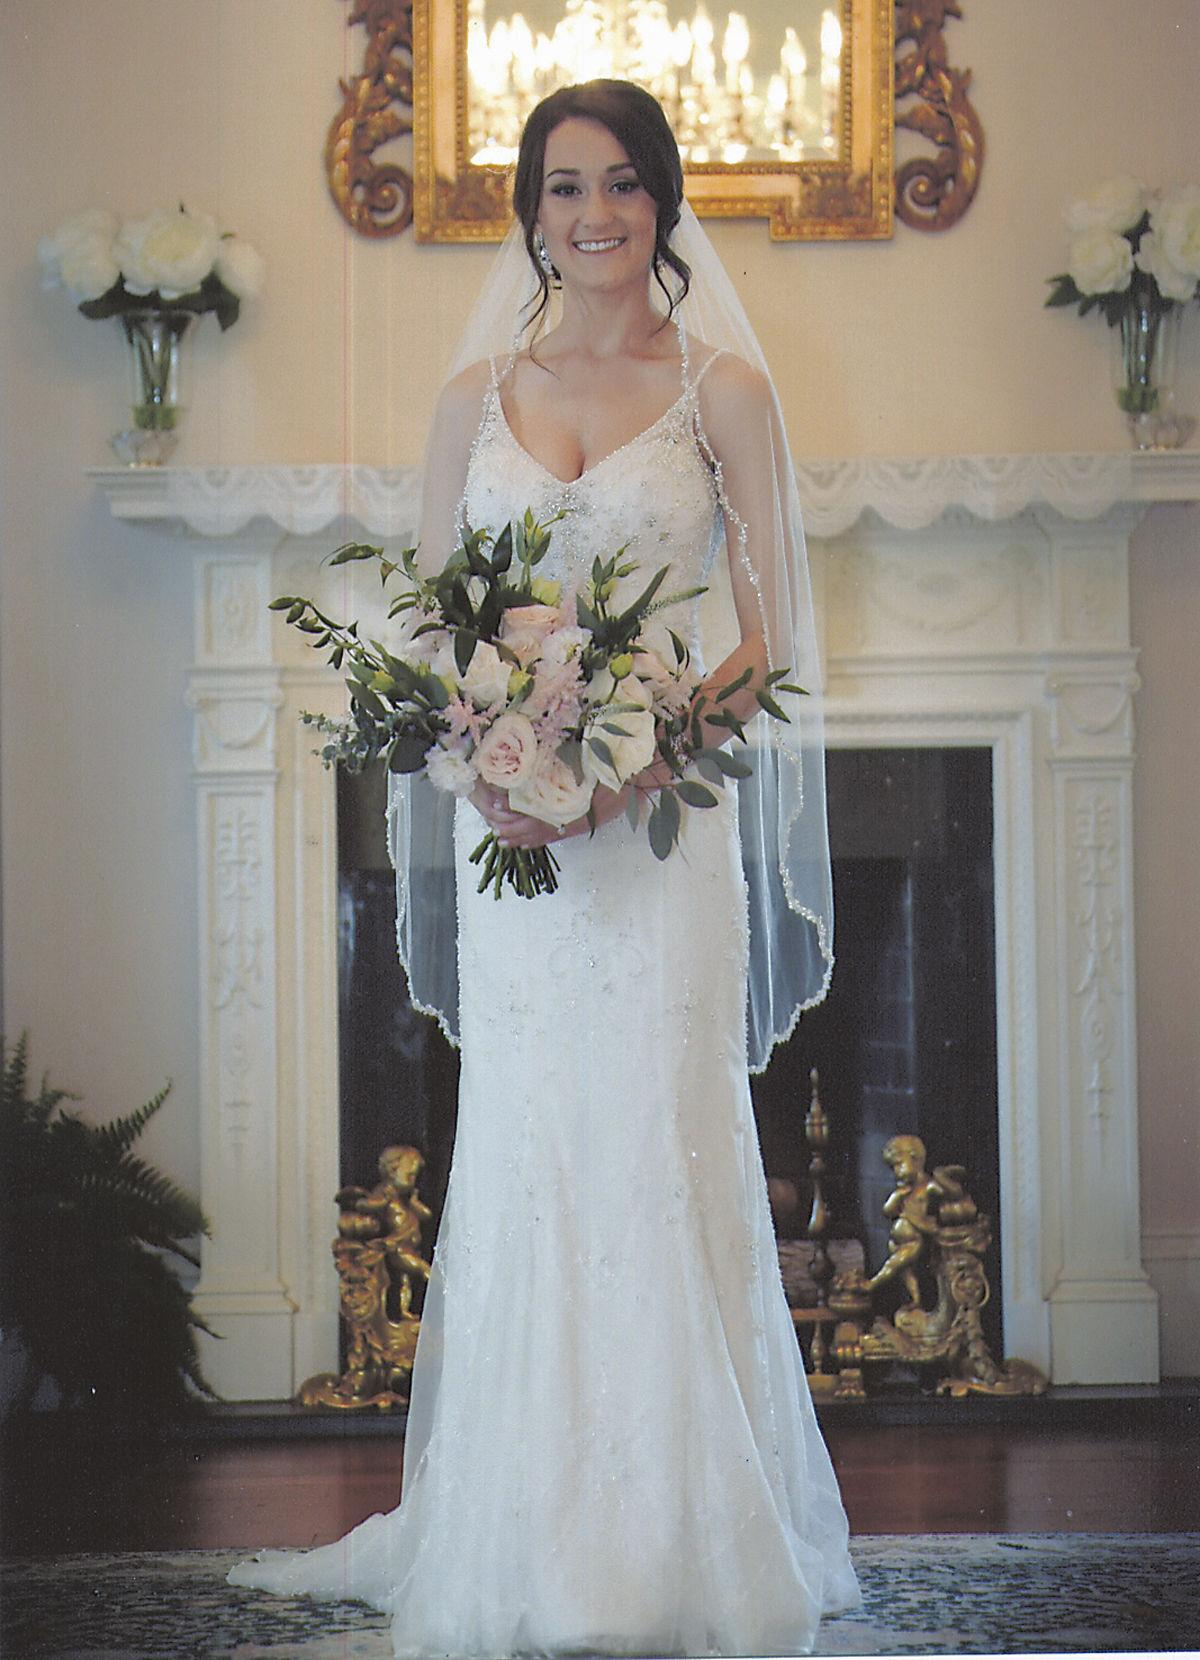 Mrs. Brennan Michael Pinell